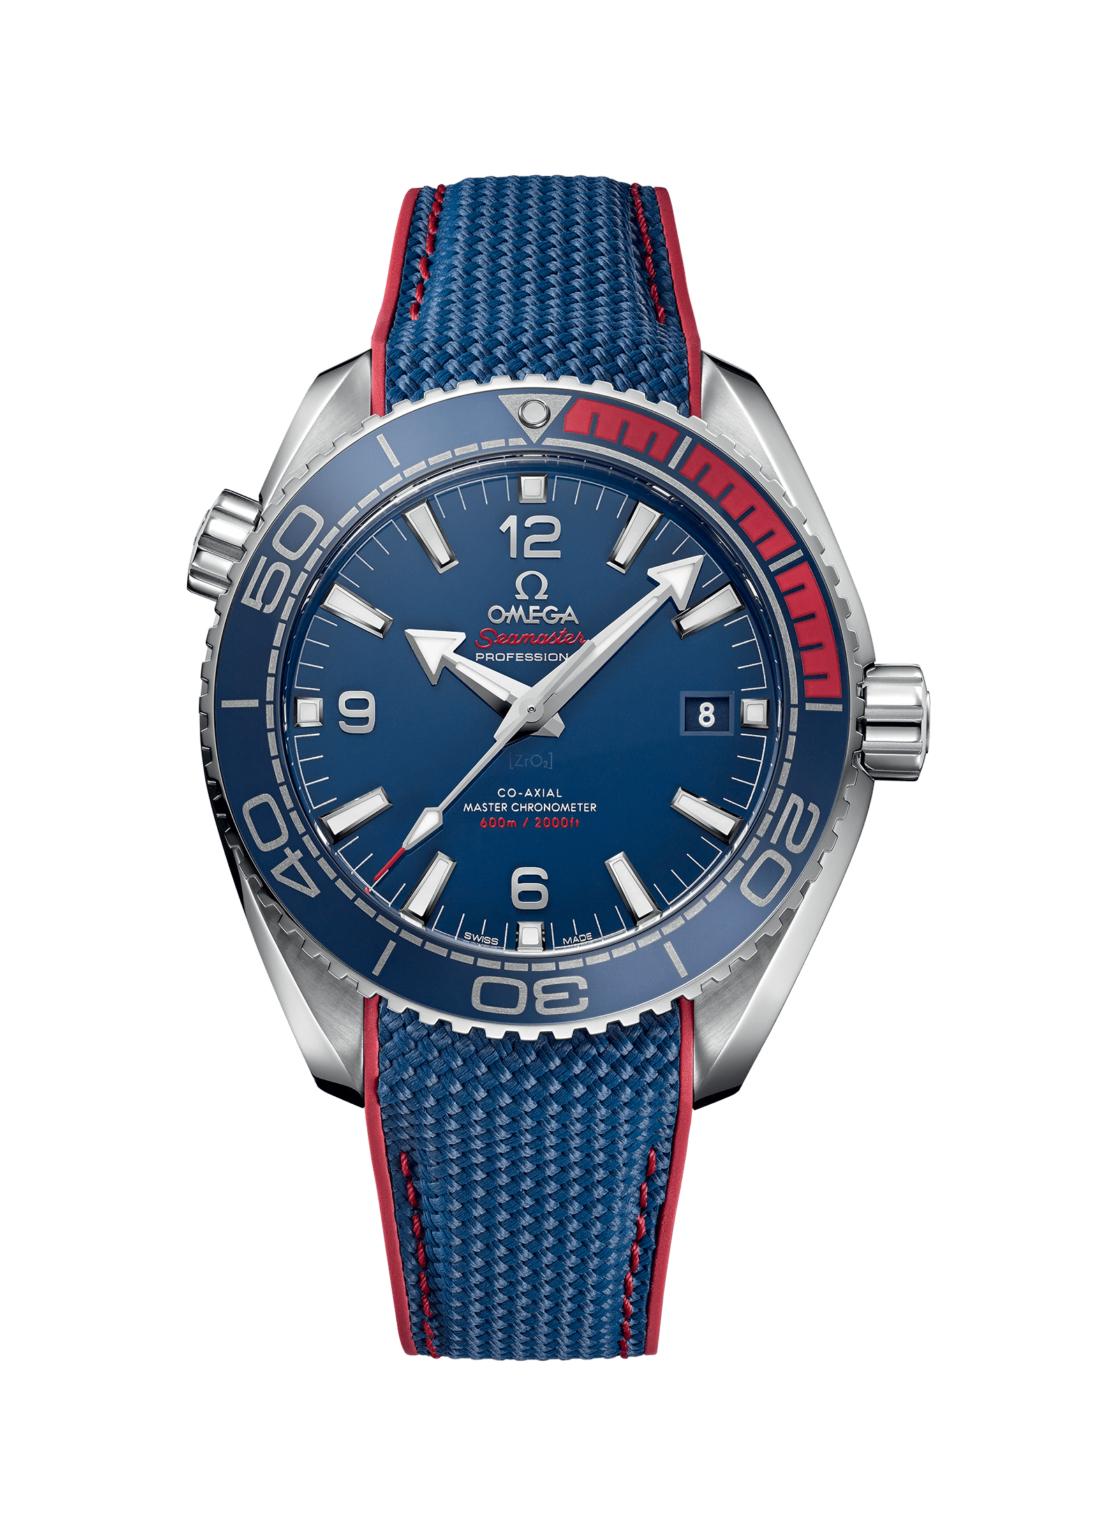 Schweizer Konzi Deal - Omega Seamaster Planet Ocean 600m Co‑Axial Master Chronometer / Kautschuk + Edelstahlband / Limitierte Automatikuhr